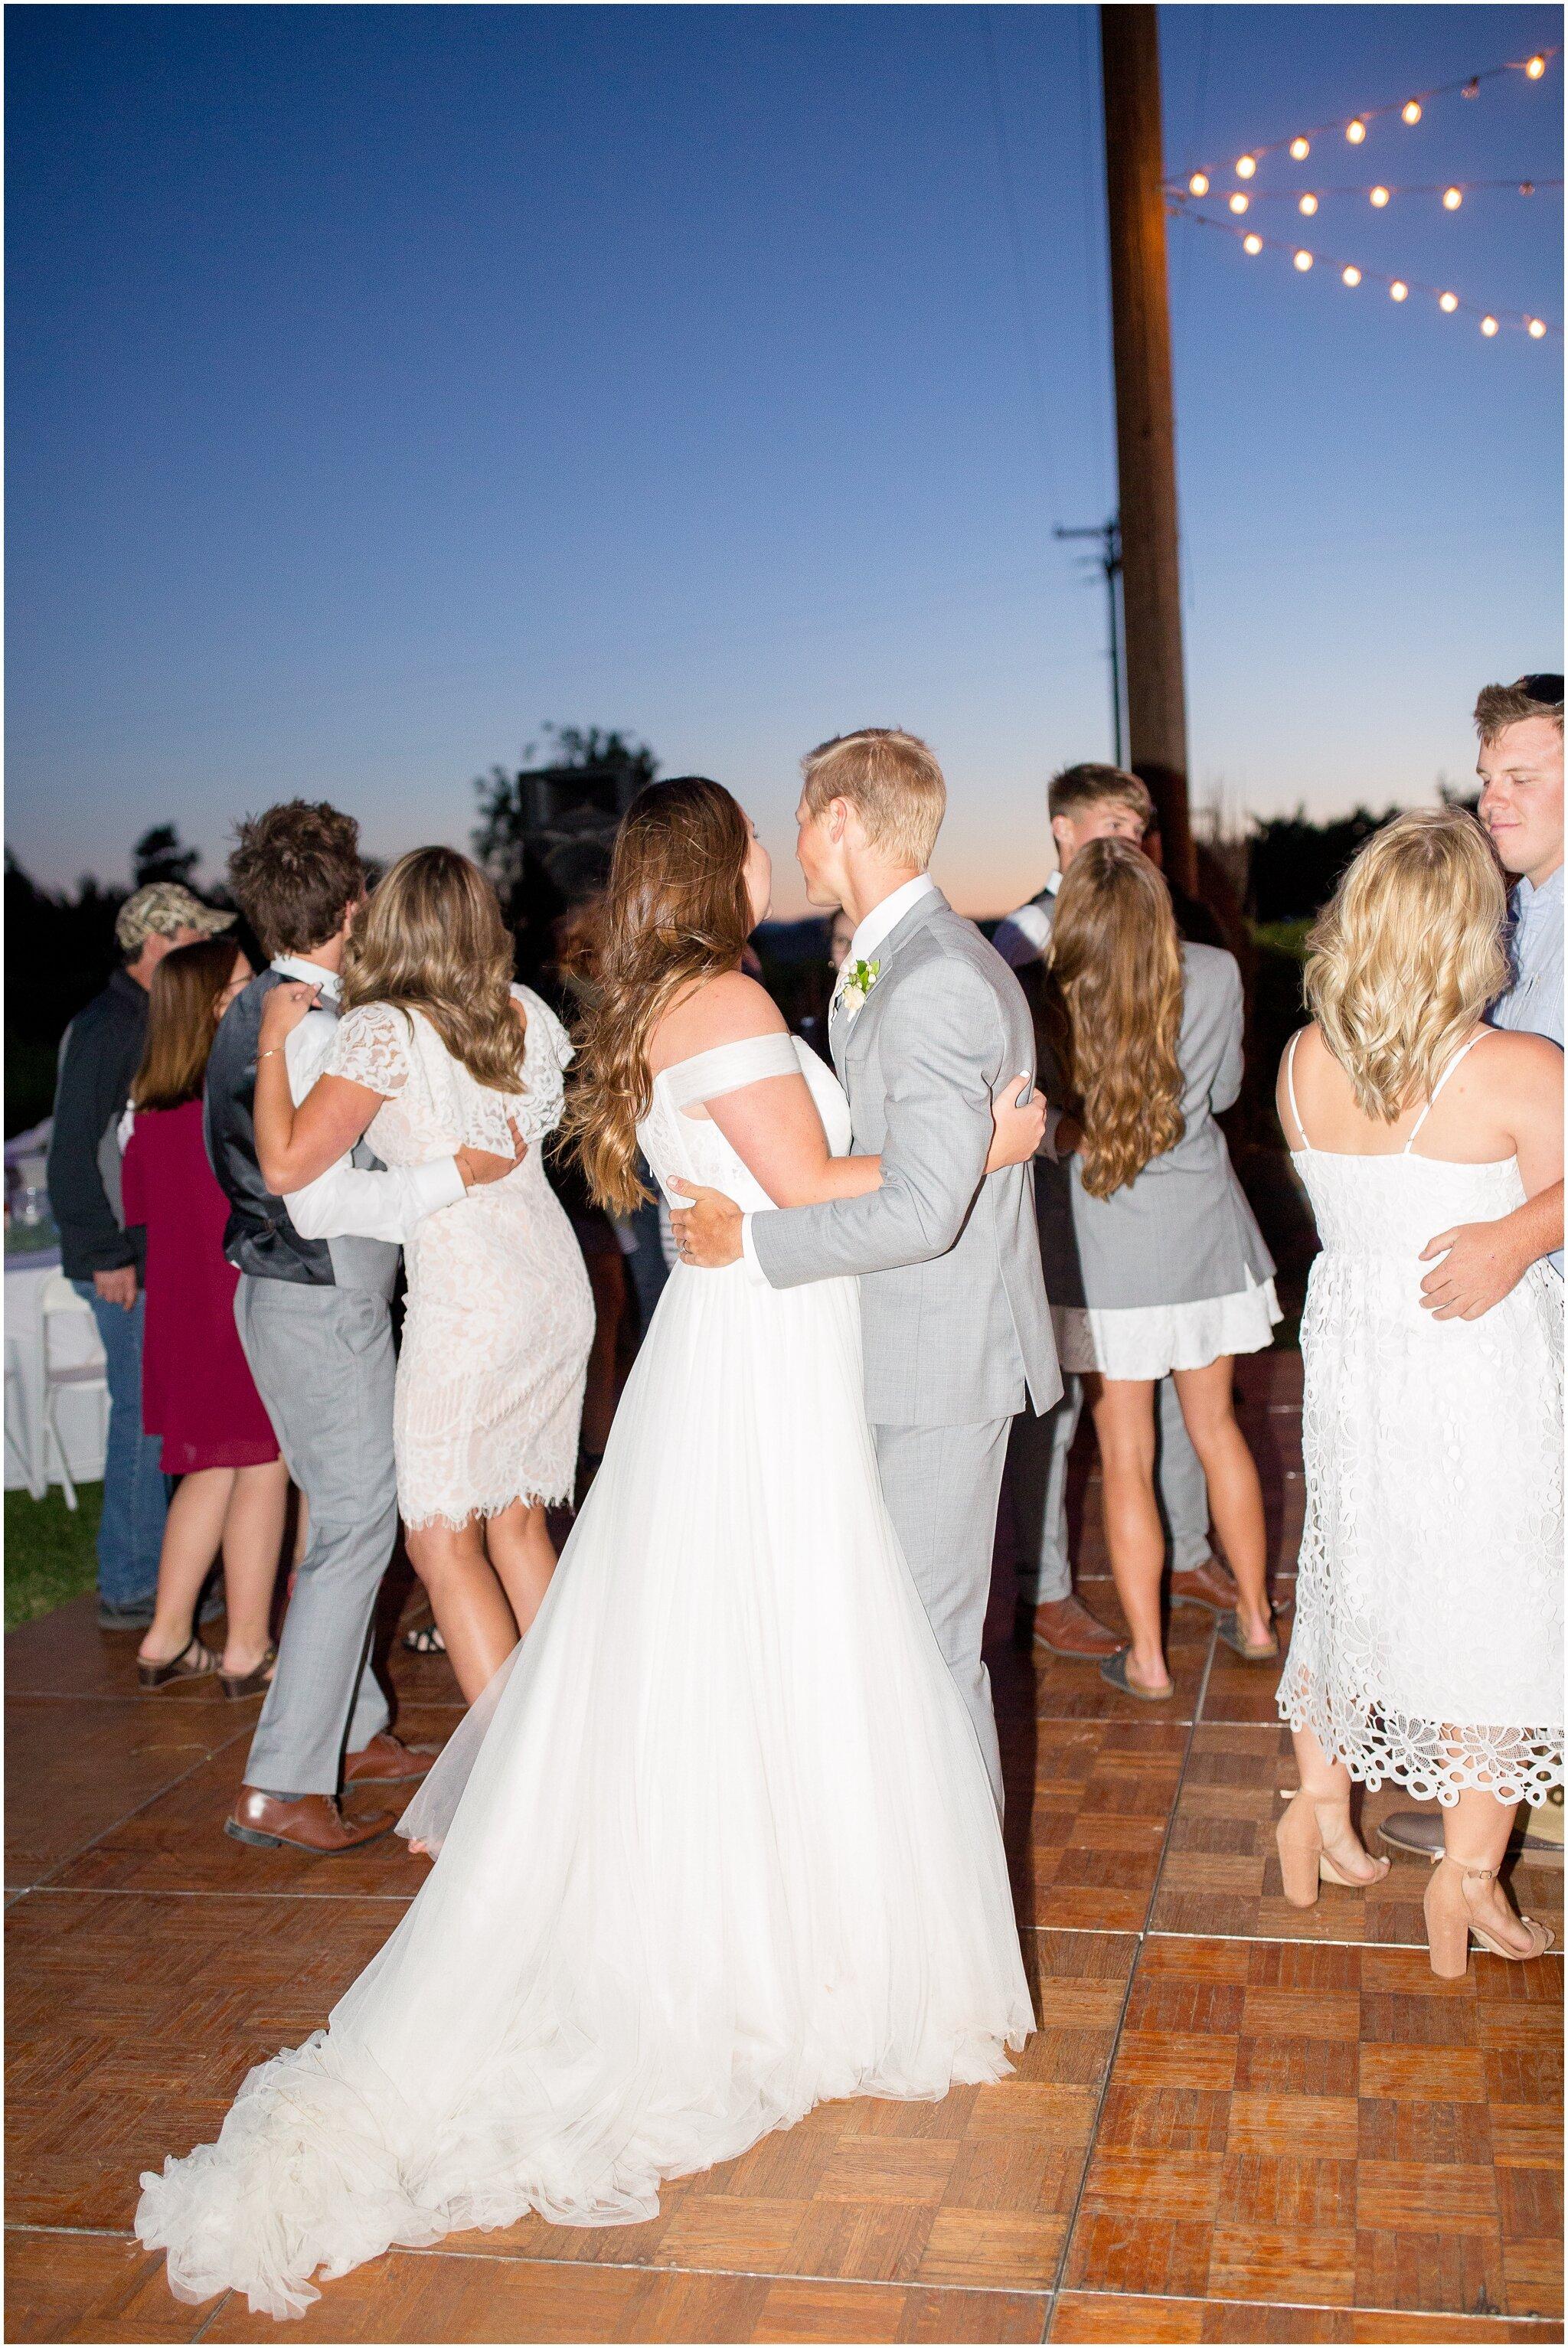 Fontaine-Estates-Winery-Wedding-Spokane-Wedding-Photographer-Taylor-Rose-Photography_0095.jpg